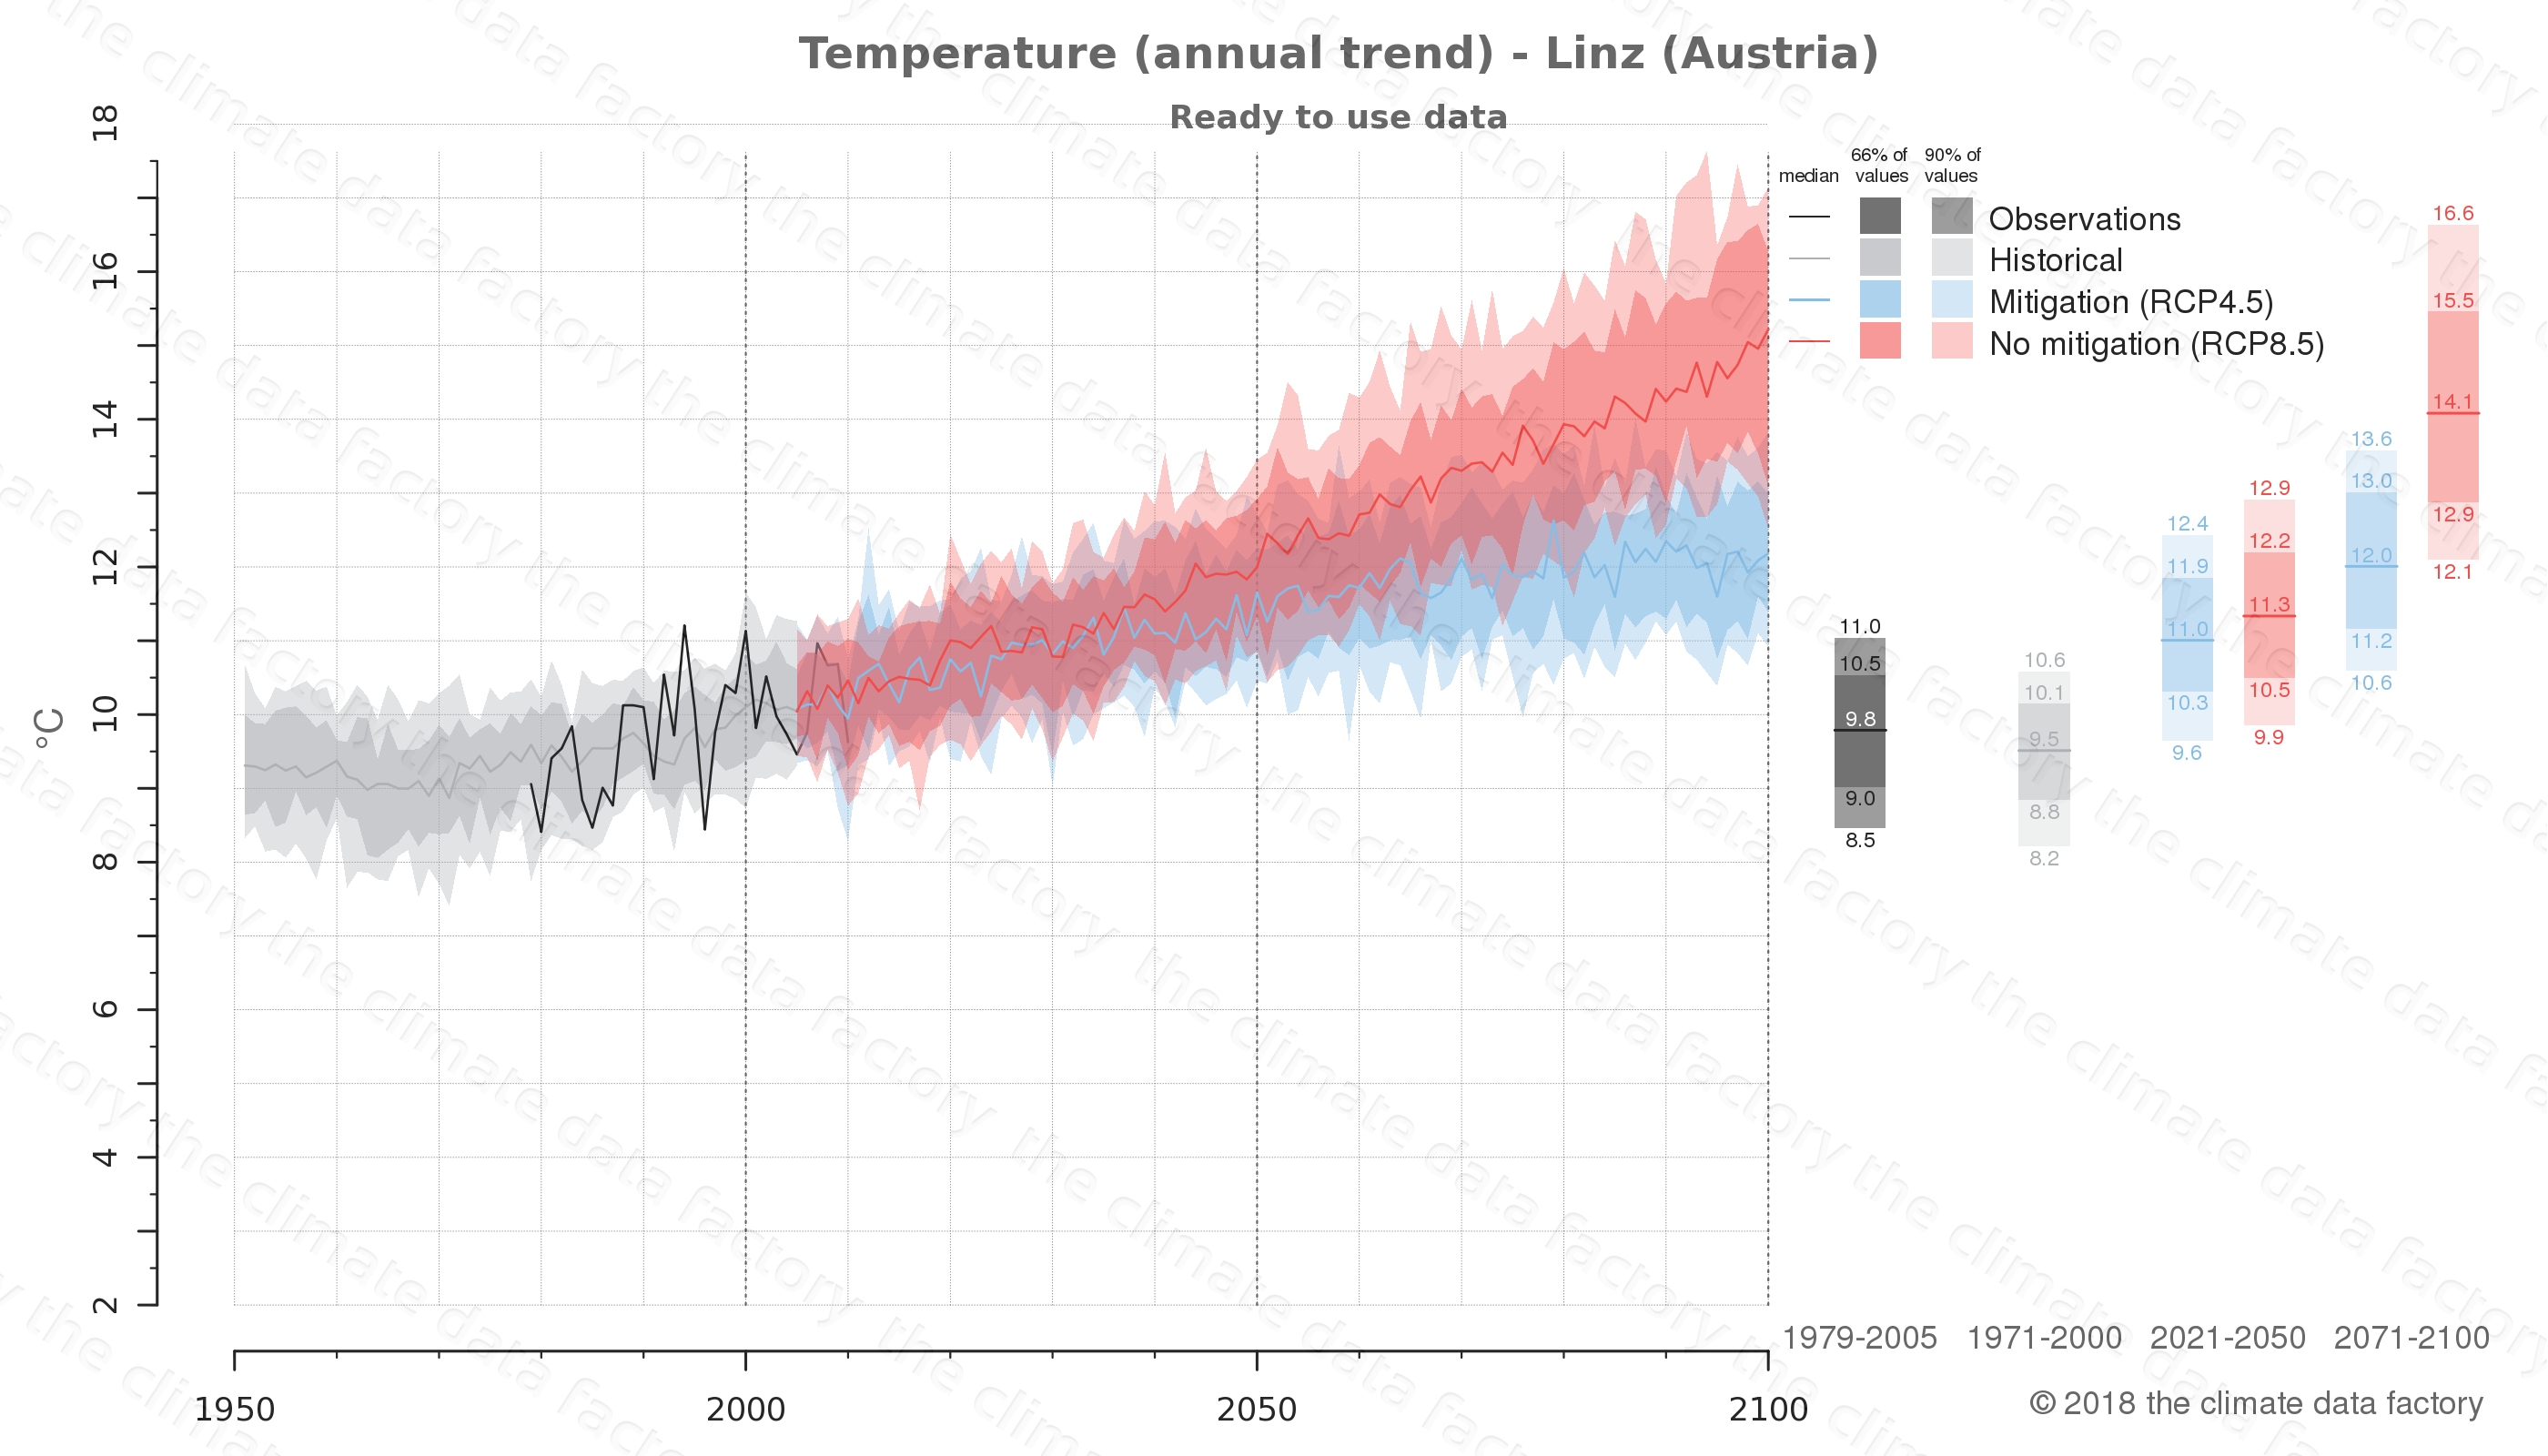 climate change data policy adaptation climate graph city data temperature linz austria